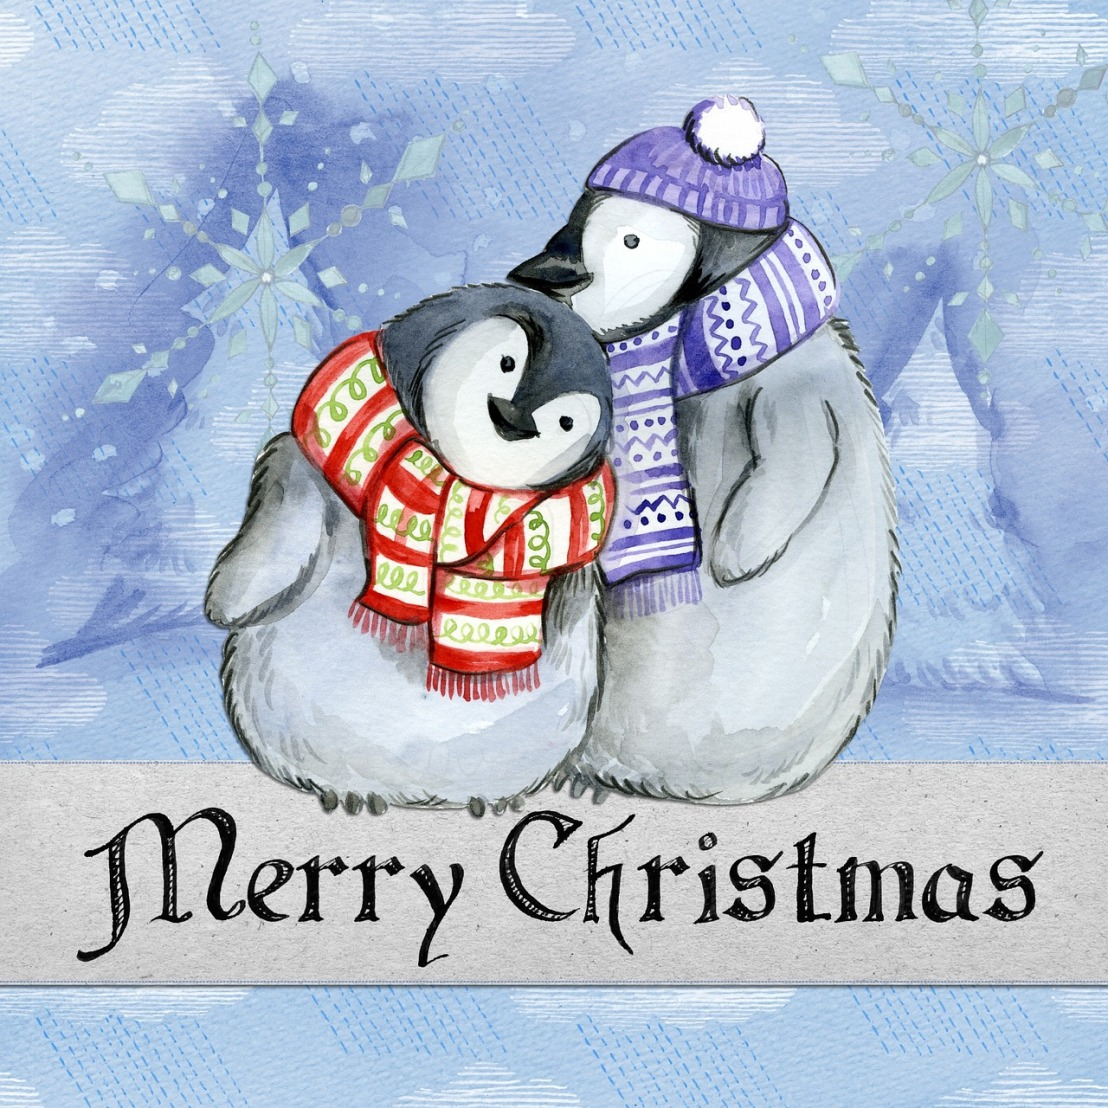 merry-christmas-2984136_1280.jpg